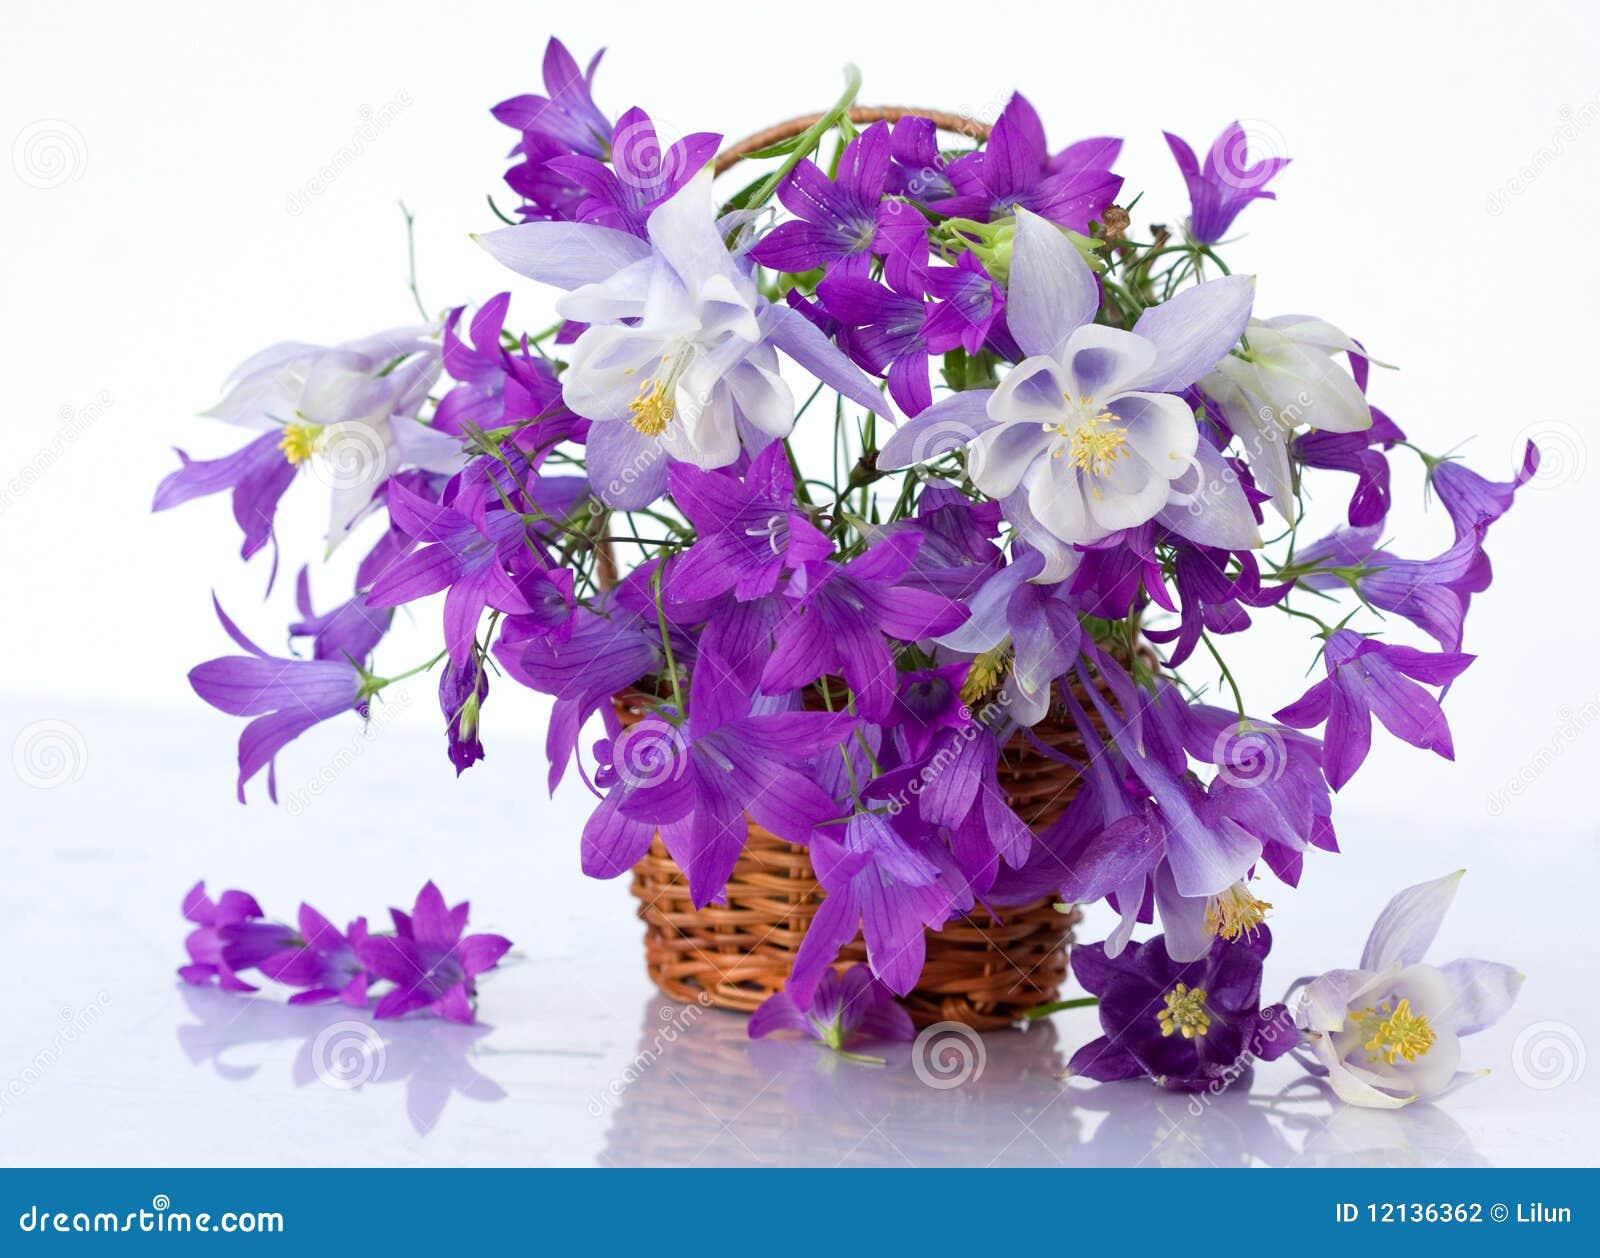 Still life flowers peonies beauty stock photos 478 images still life with flowers peonies beauty bouquet of flowers purple bells aquilegia and white izmirmasajfo